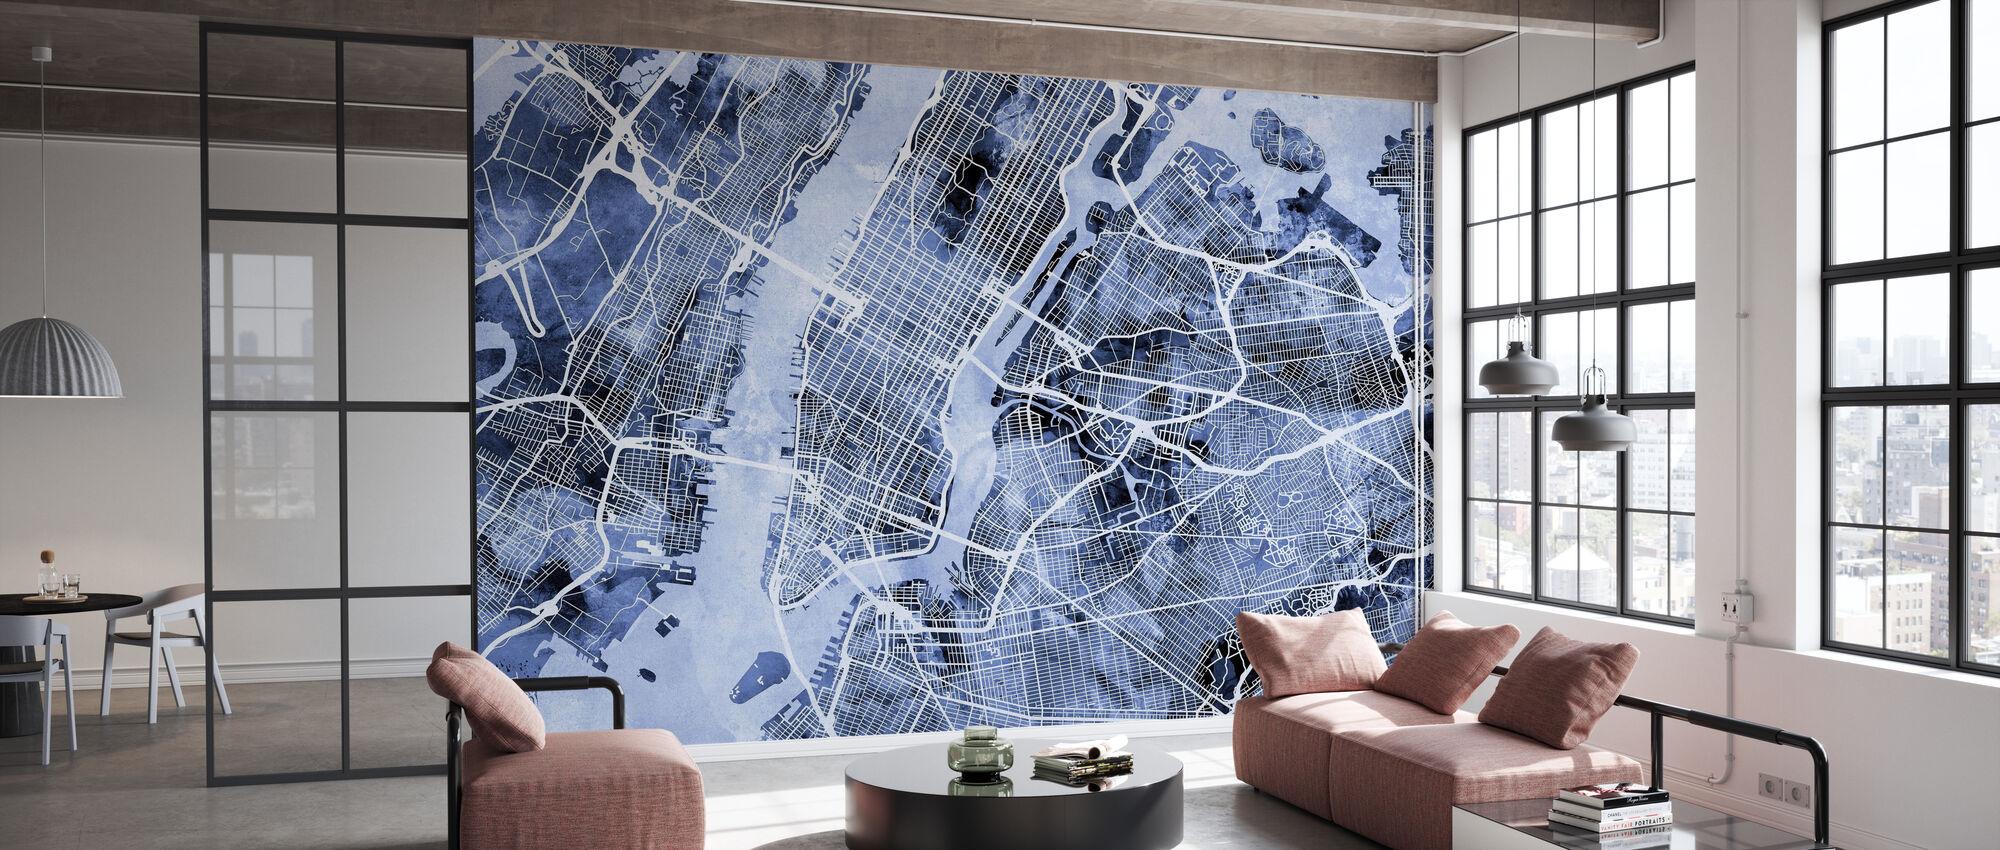 New York City Street Map - Wallpaper - Office